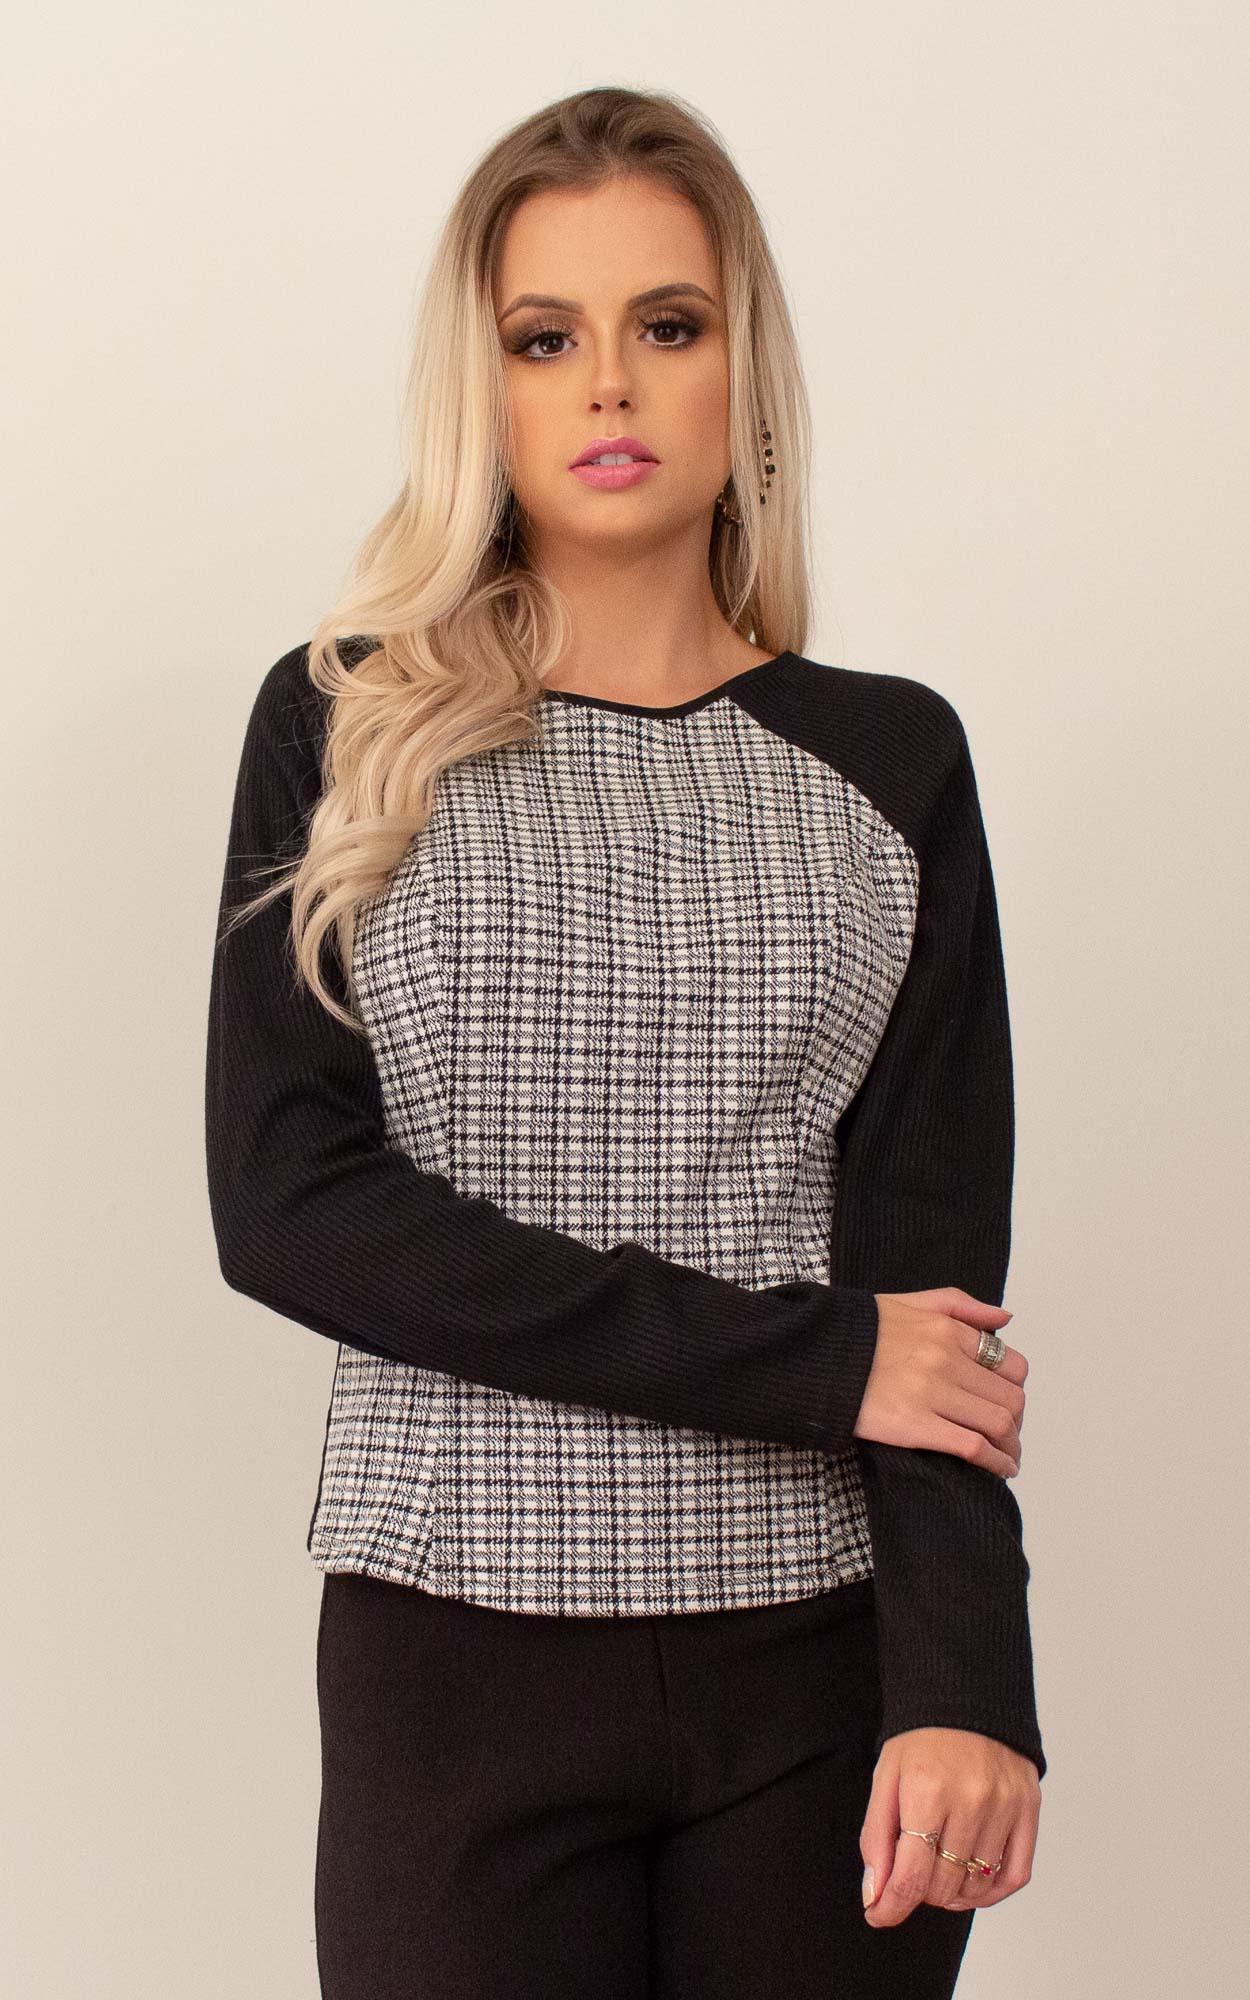 Blusa manga longa com detalhe xadrez